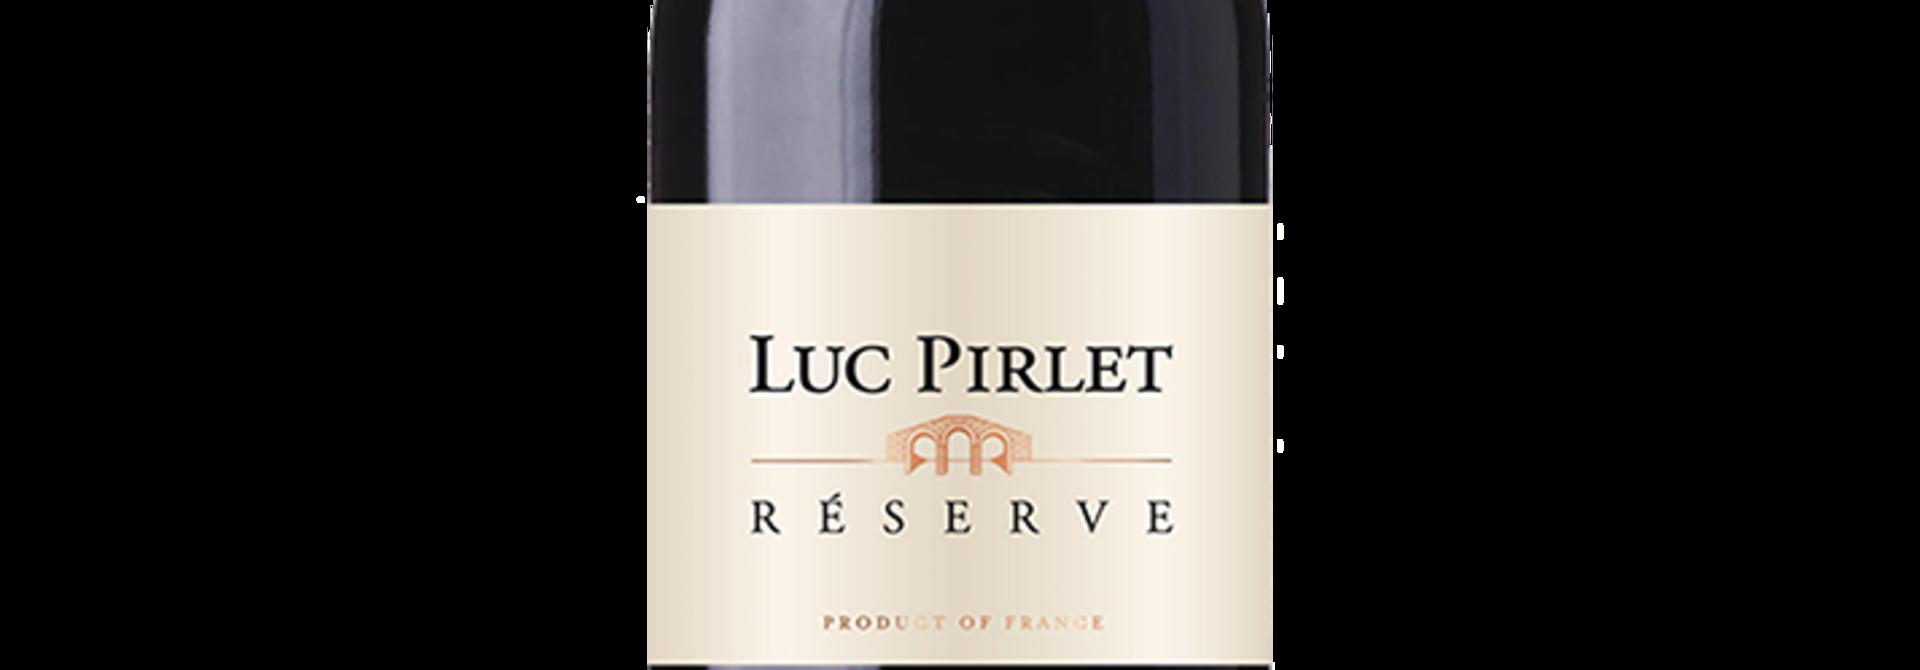 Luc Pirlet Reserve Cabernet Sauvignon